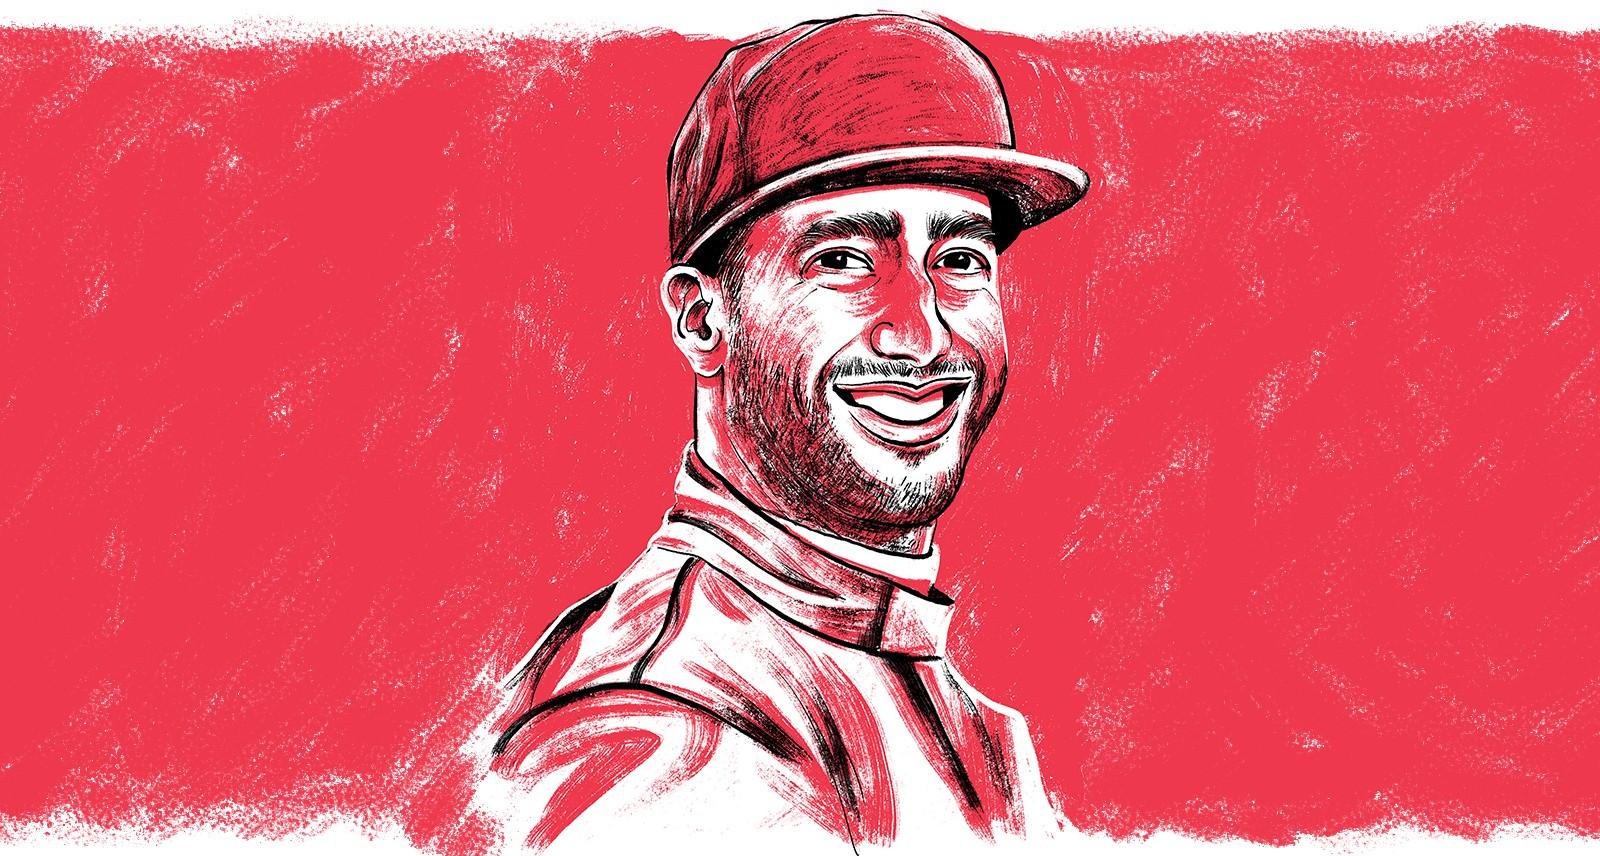 Daniel Ricciardo on Work-Life Balance, His Secret Killer Instinct, and Being an Alexisonfire Fanboy